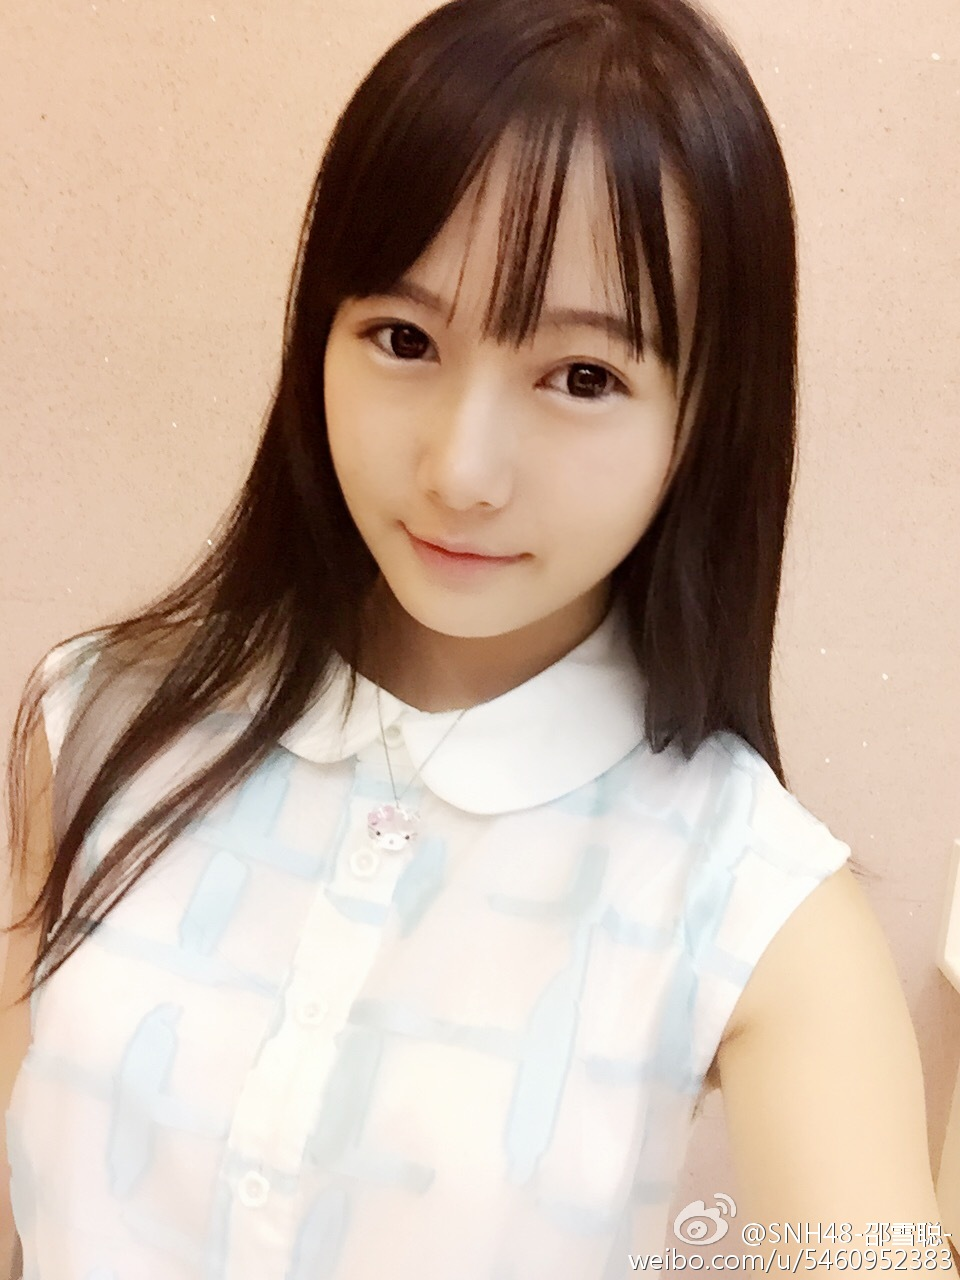 【SNH48】最高の美貌と情熱を併せ持つチームXセンター邵雪聰(シャオ・シュエツォン)のプロフィール更新